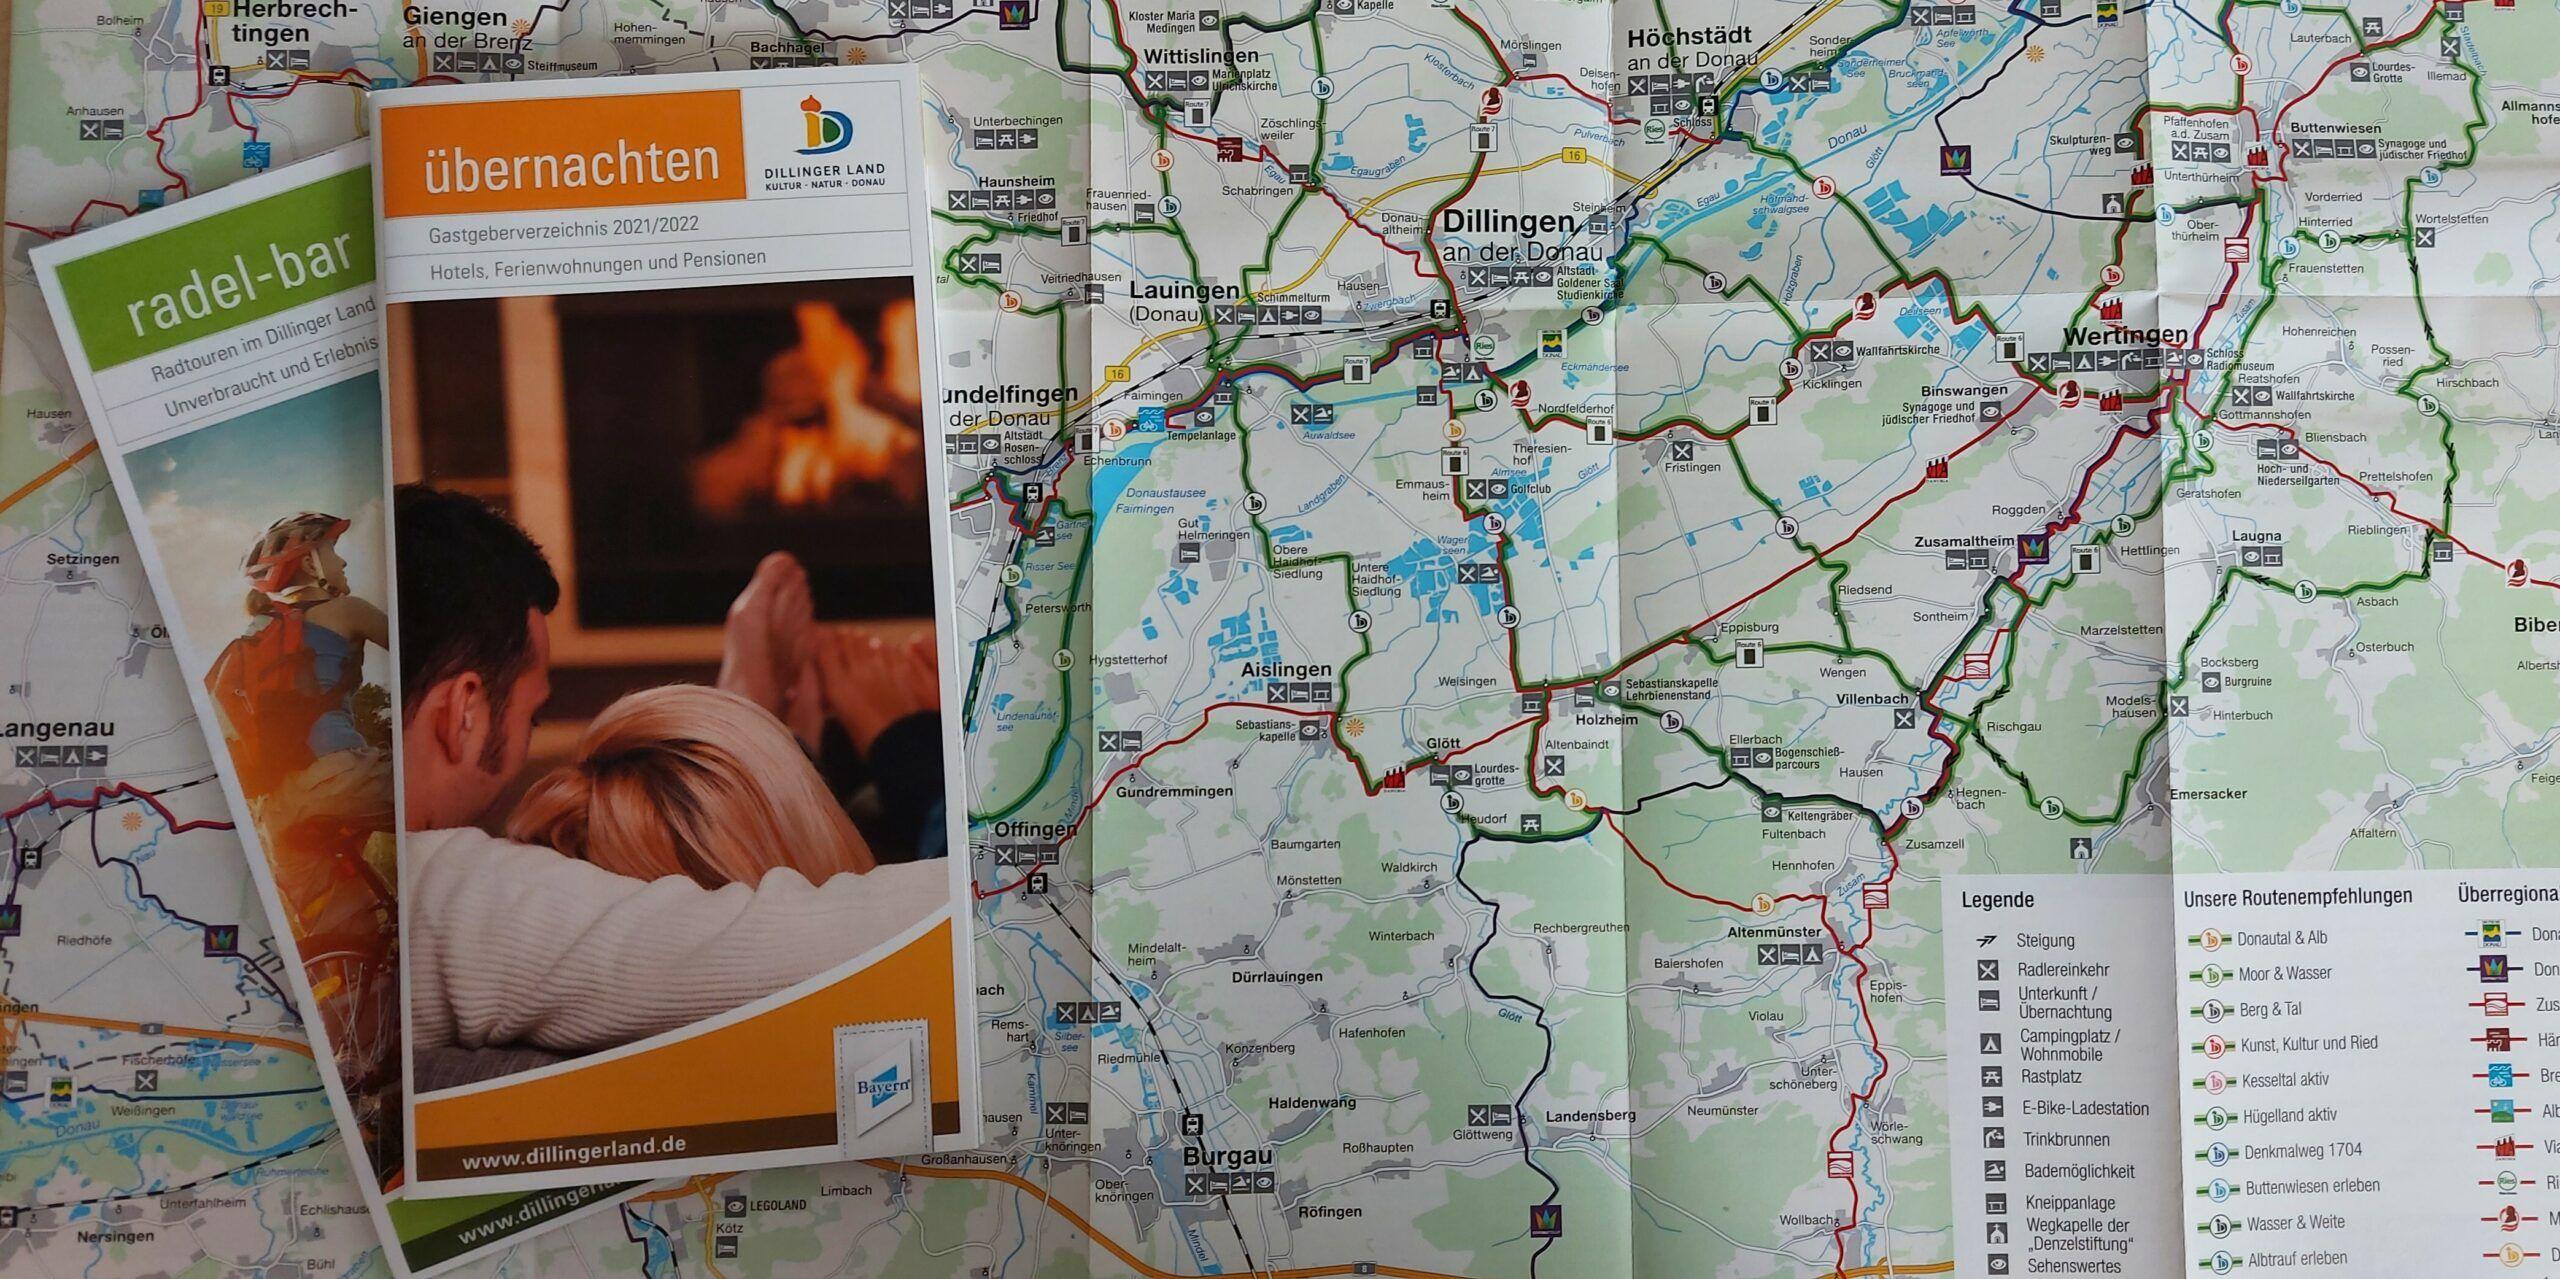 Ggv Radelbar Dillinger Land 2021 C Angelika Tittl Donautal Aktiv E.v. Scaled